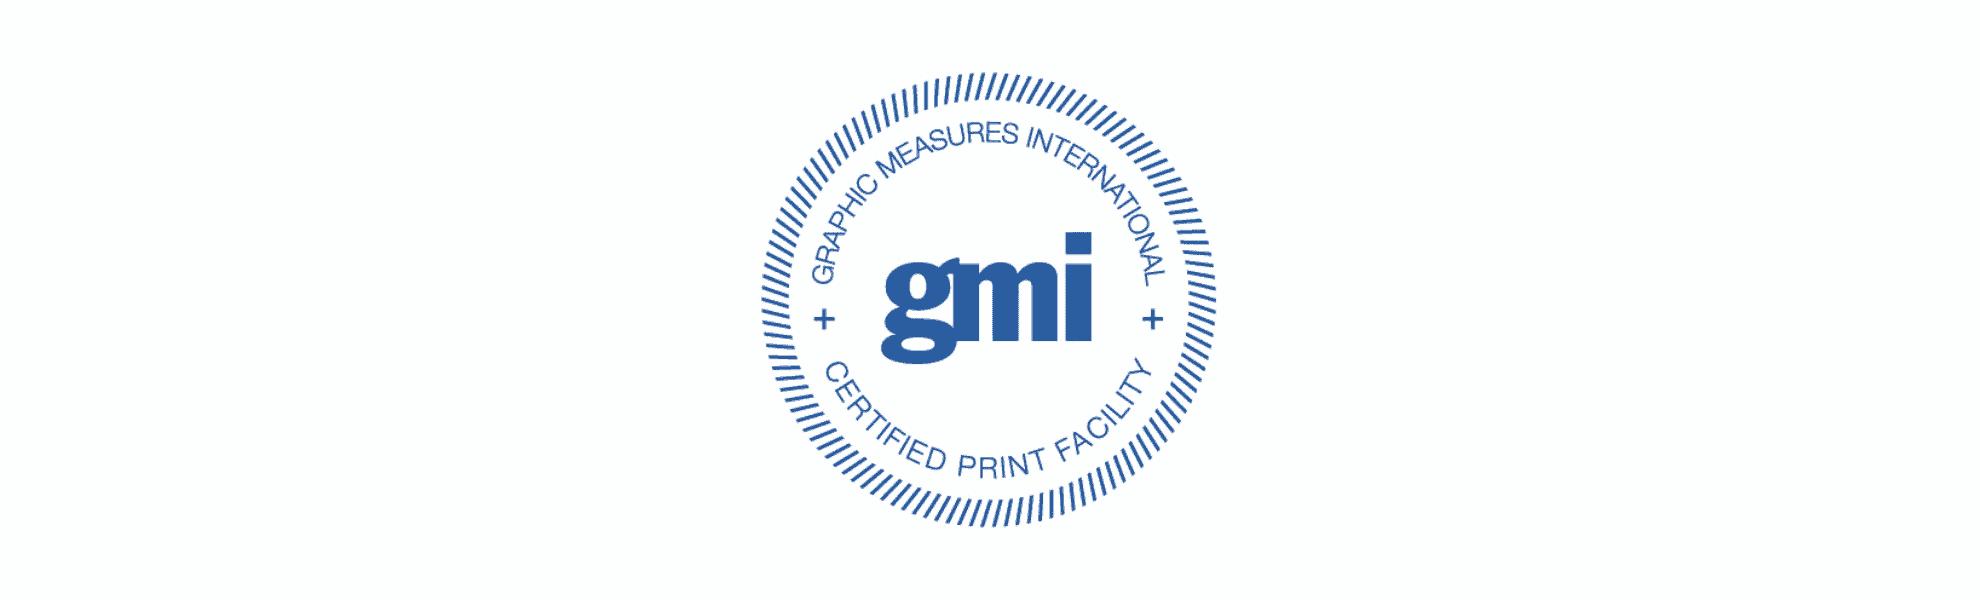 bannière certification GMI profecta